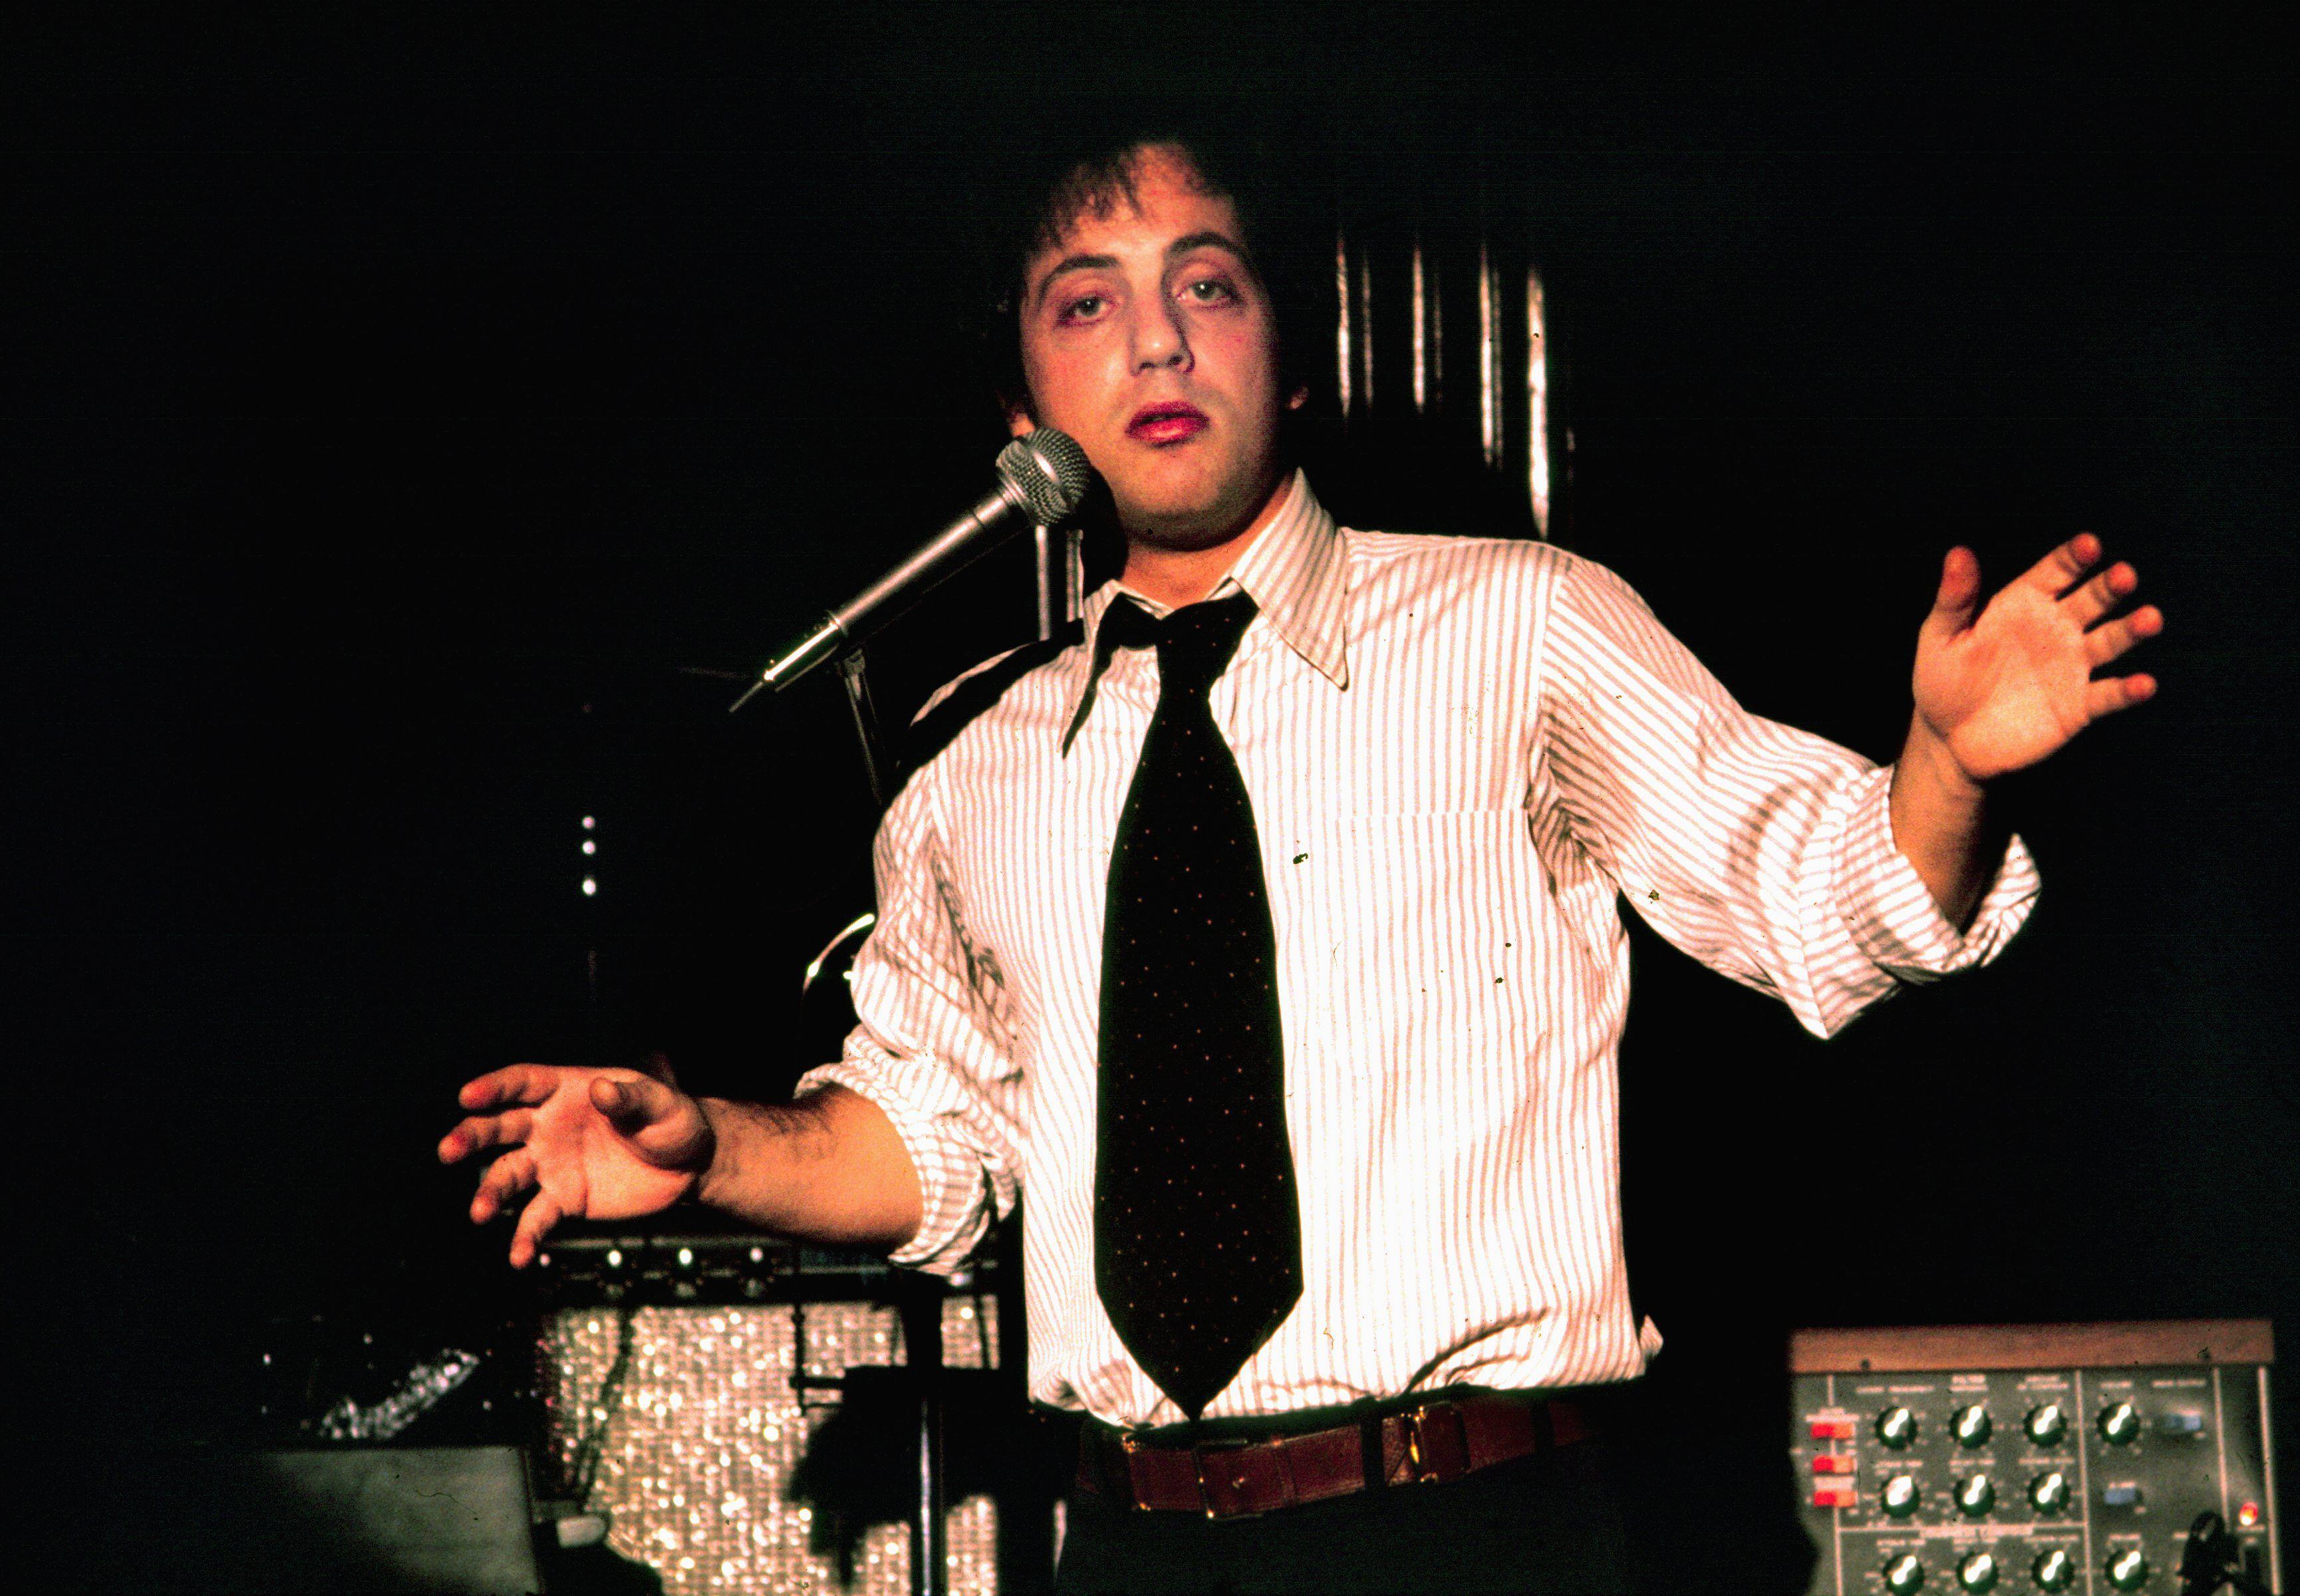 Billy Joel S 20 Best Songs Of All Time